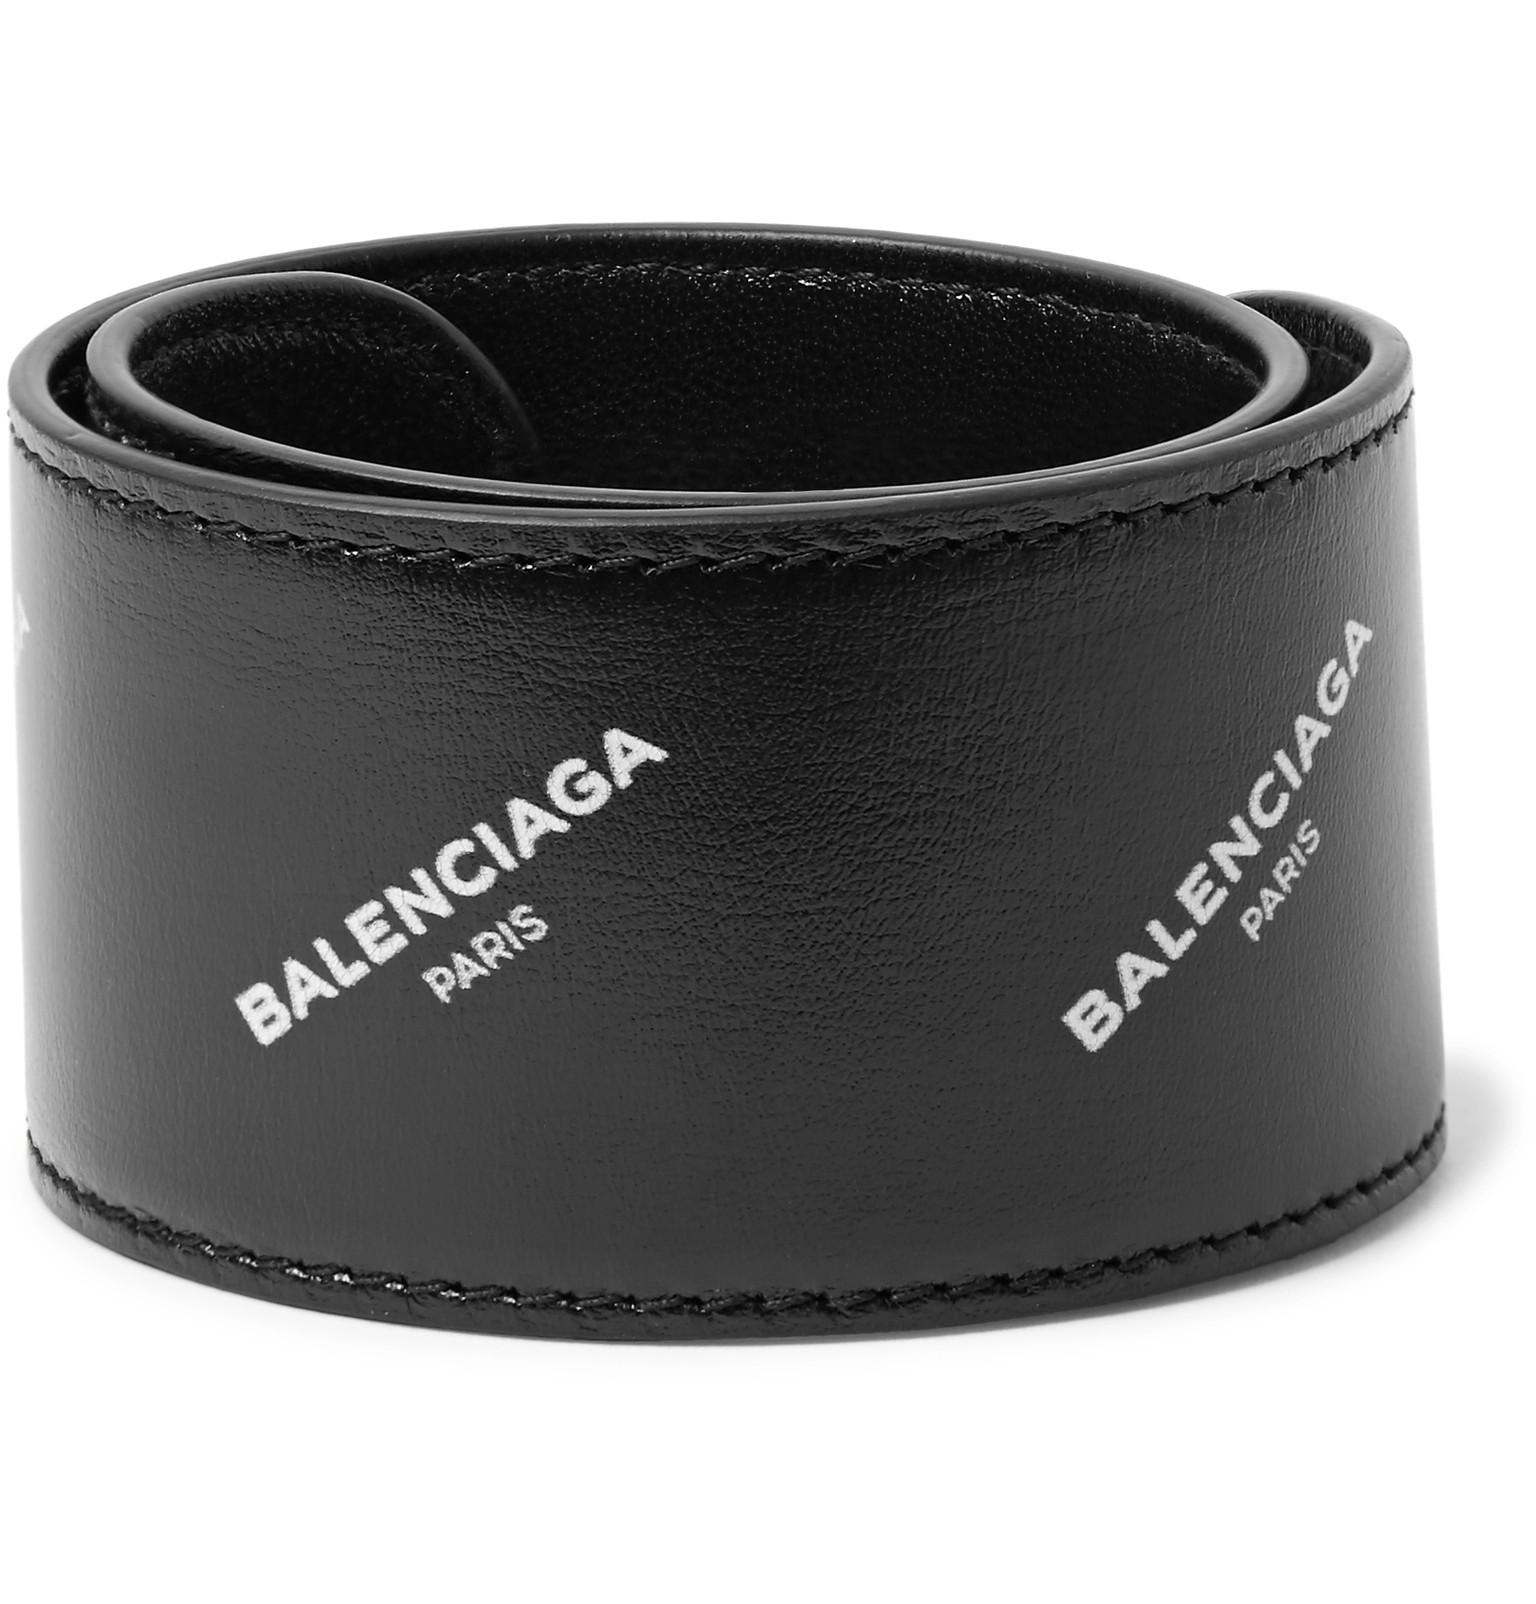 Balenciaga Printed Leather Snap Bracelet - Black CsdbVh4DCj